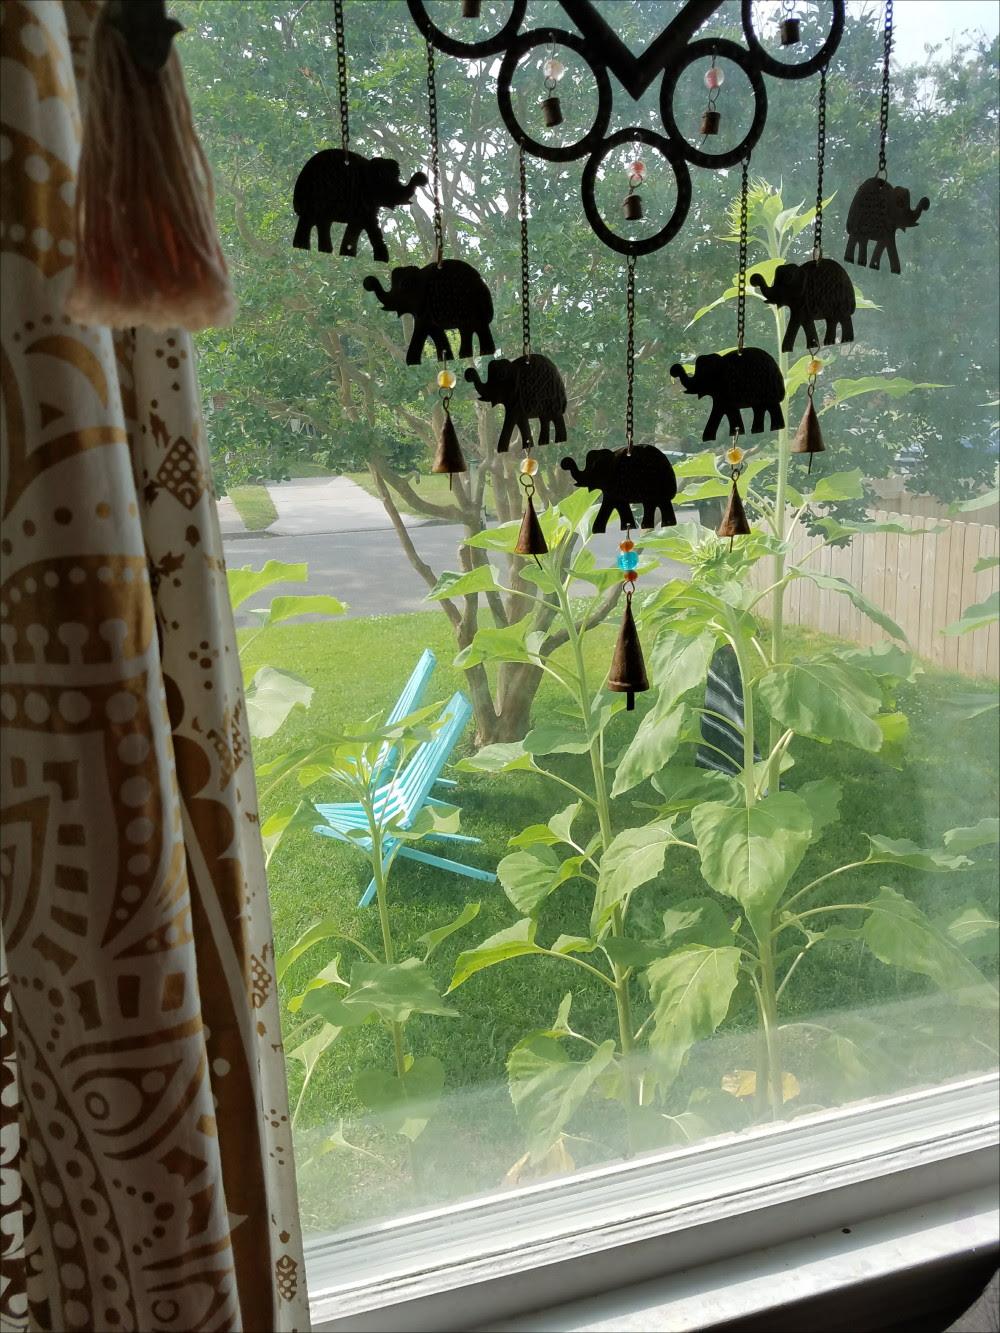 Looking put the window. Giant sunflowers, aqua yard chairs, elephant sunshine. - @adesignerathome